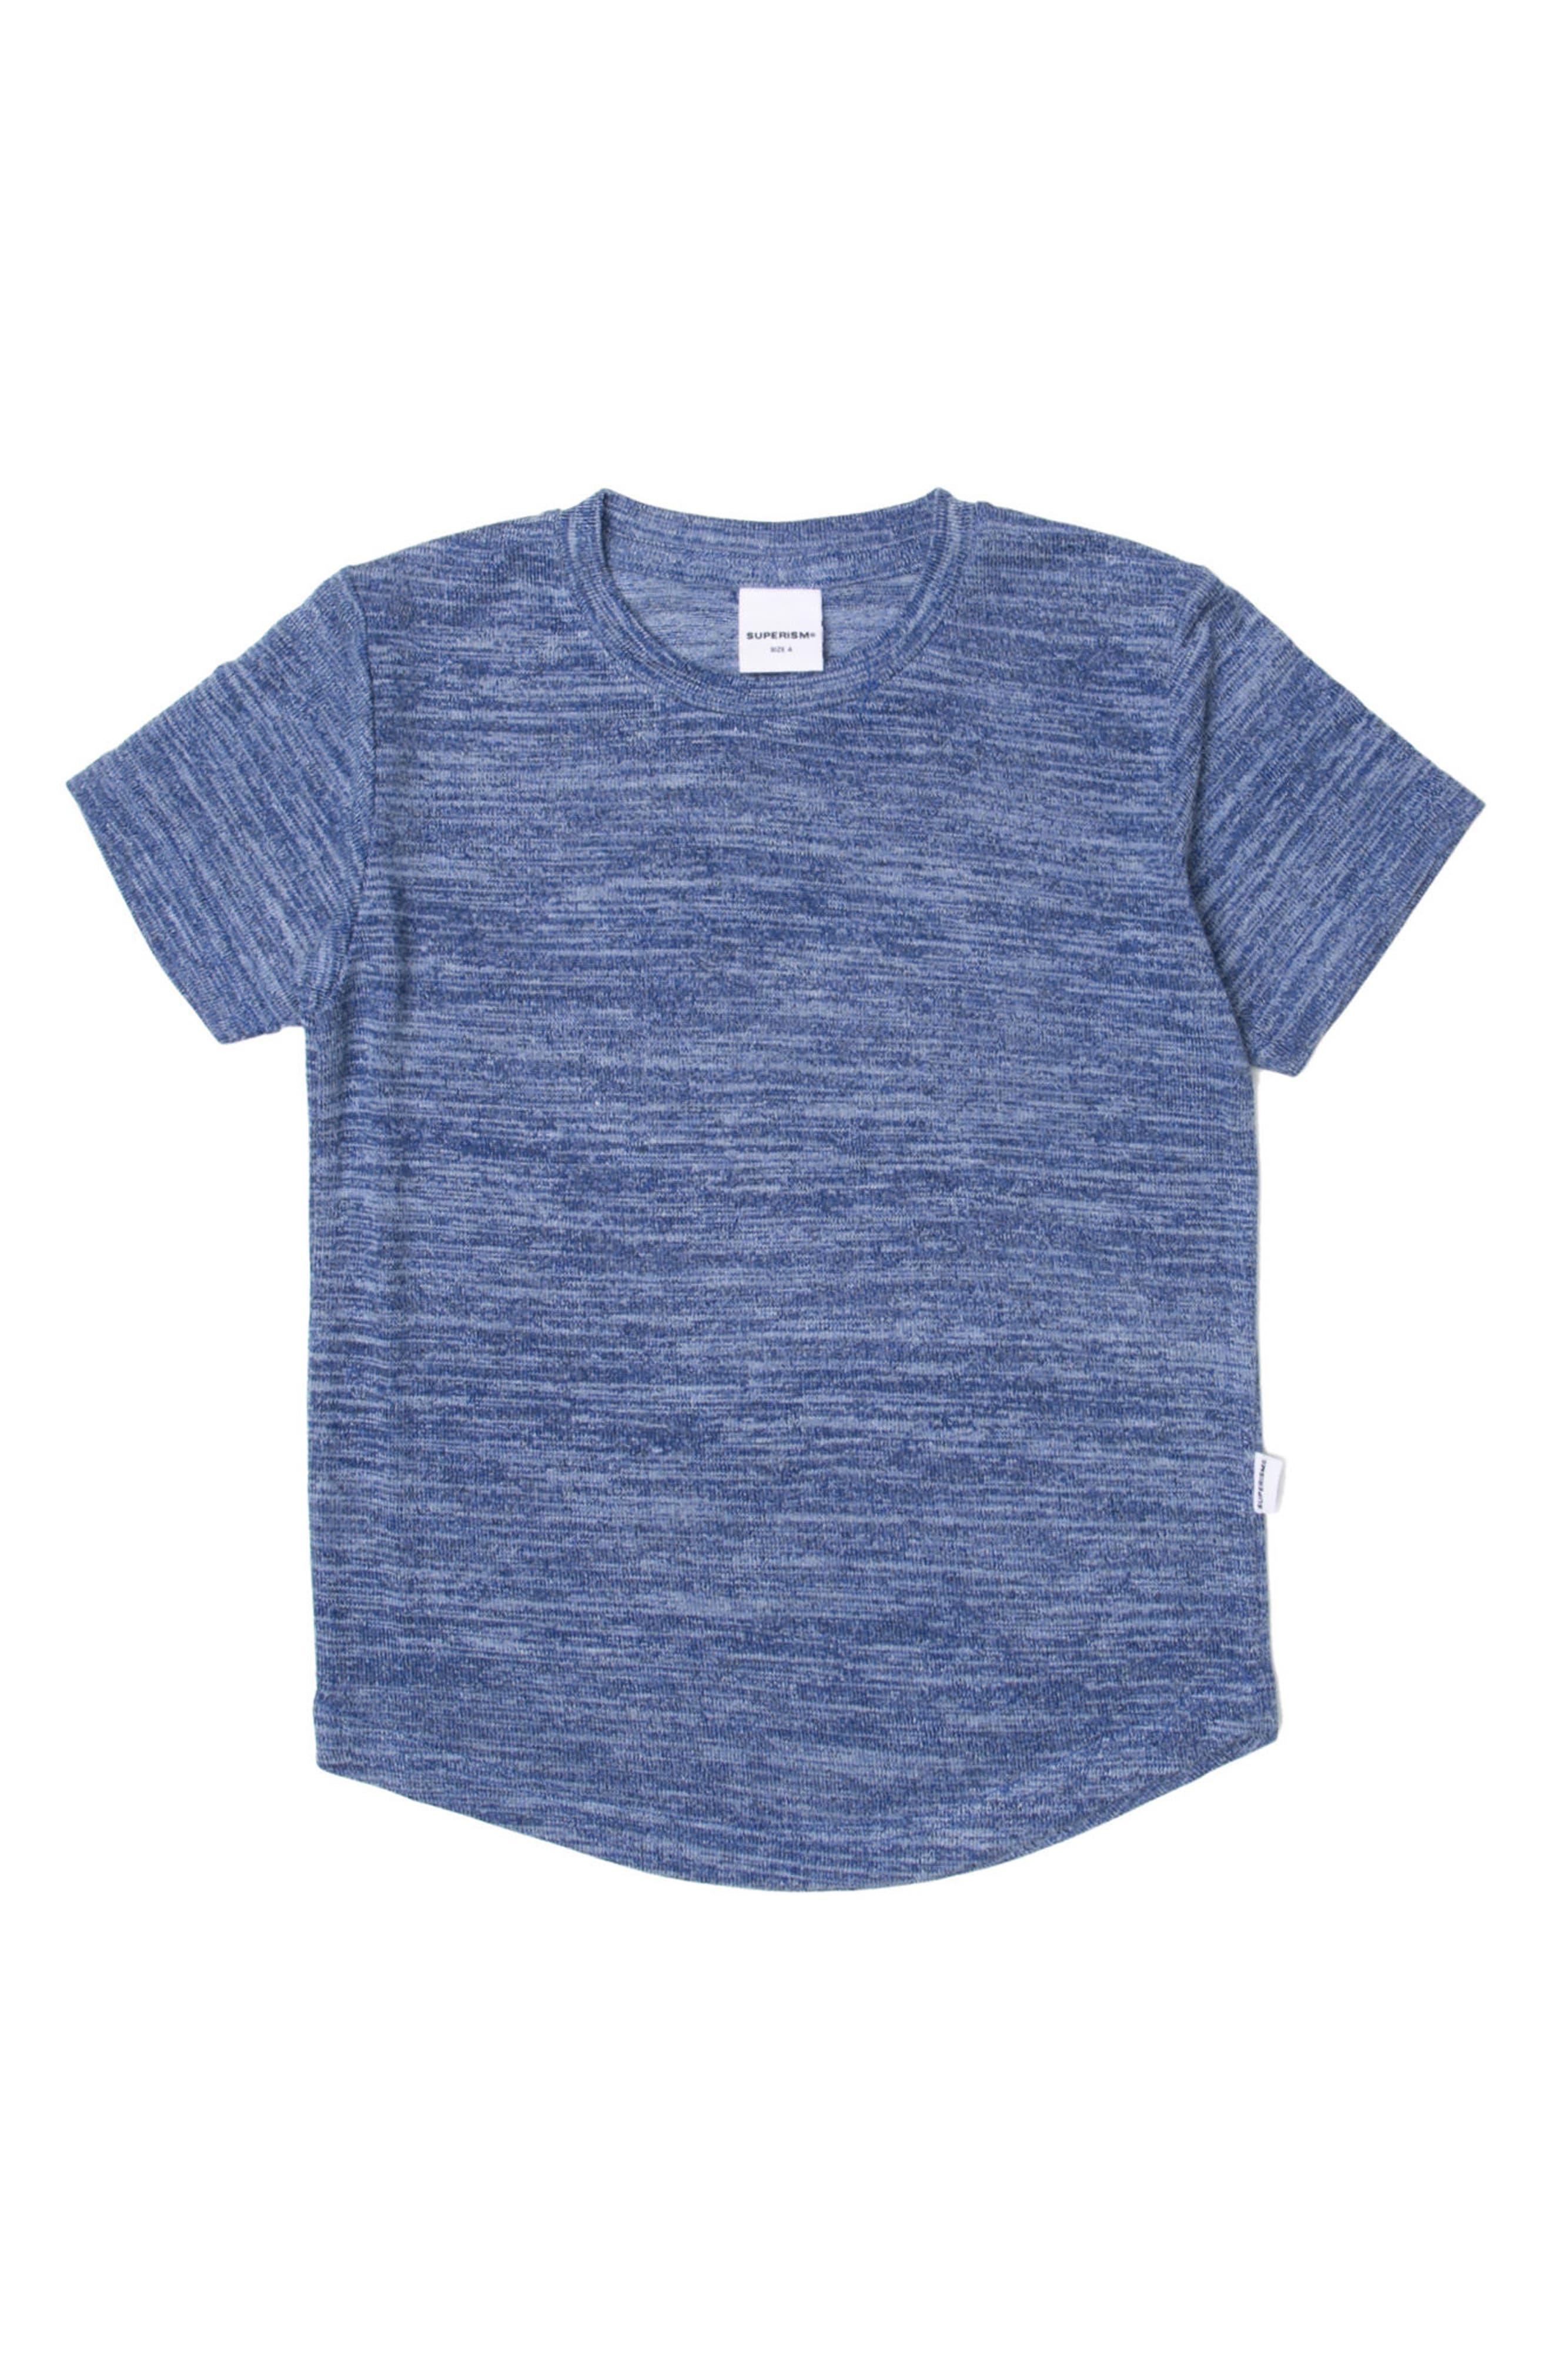 Main Image - Superism Landon T-Shirt (Toddler Boys & Little Boys)